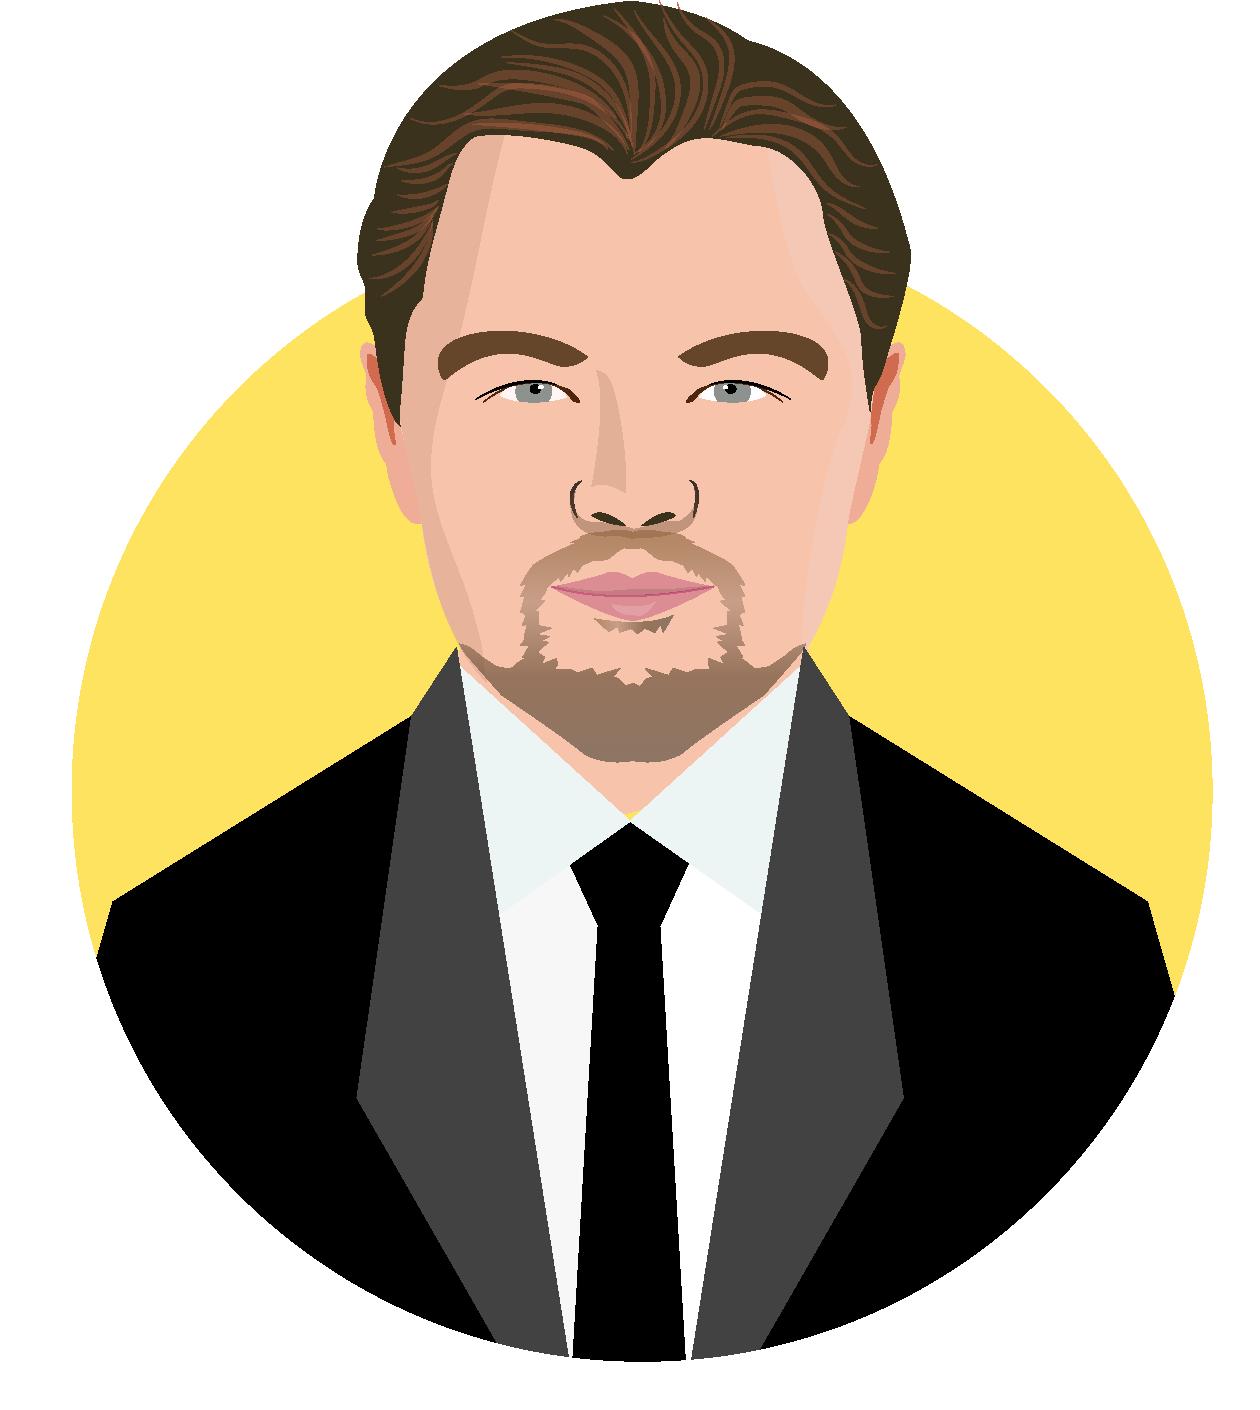 png transparent library Vector avatar minimal. Draw unique flat portrait